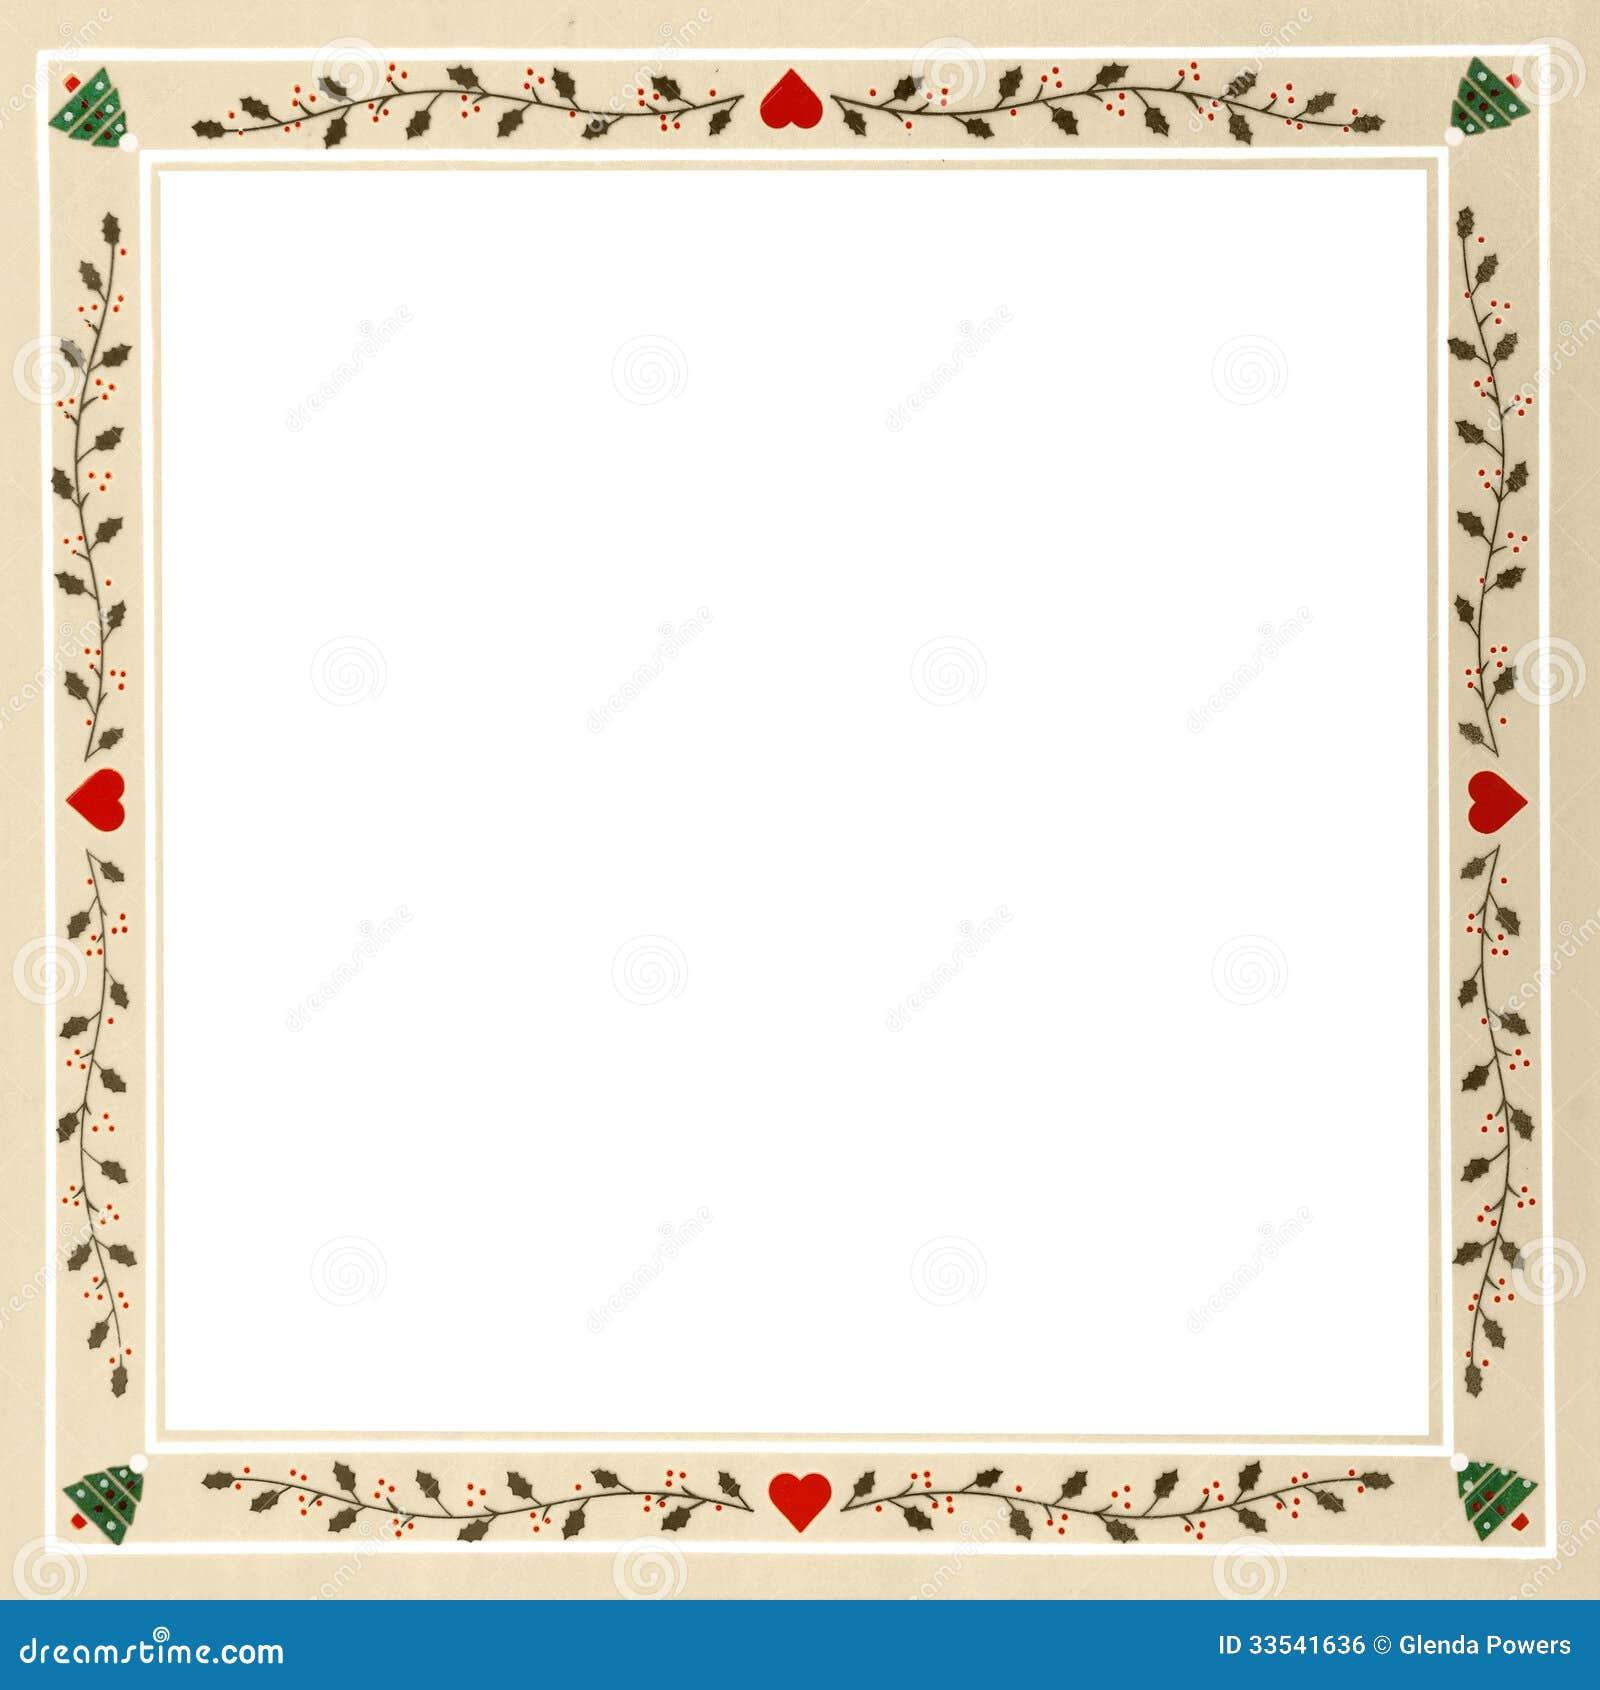 Pennsylvania Dutch Christmas Frame Royalty Free Stock Image ...